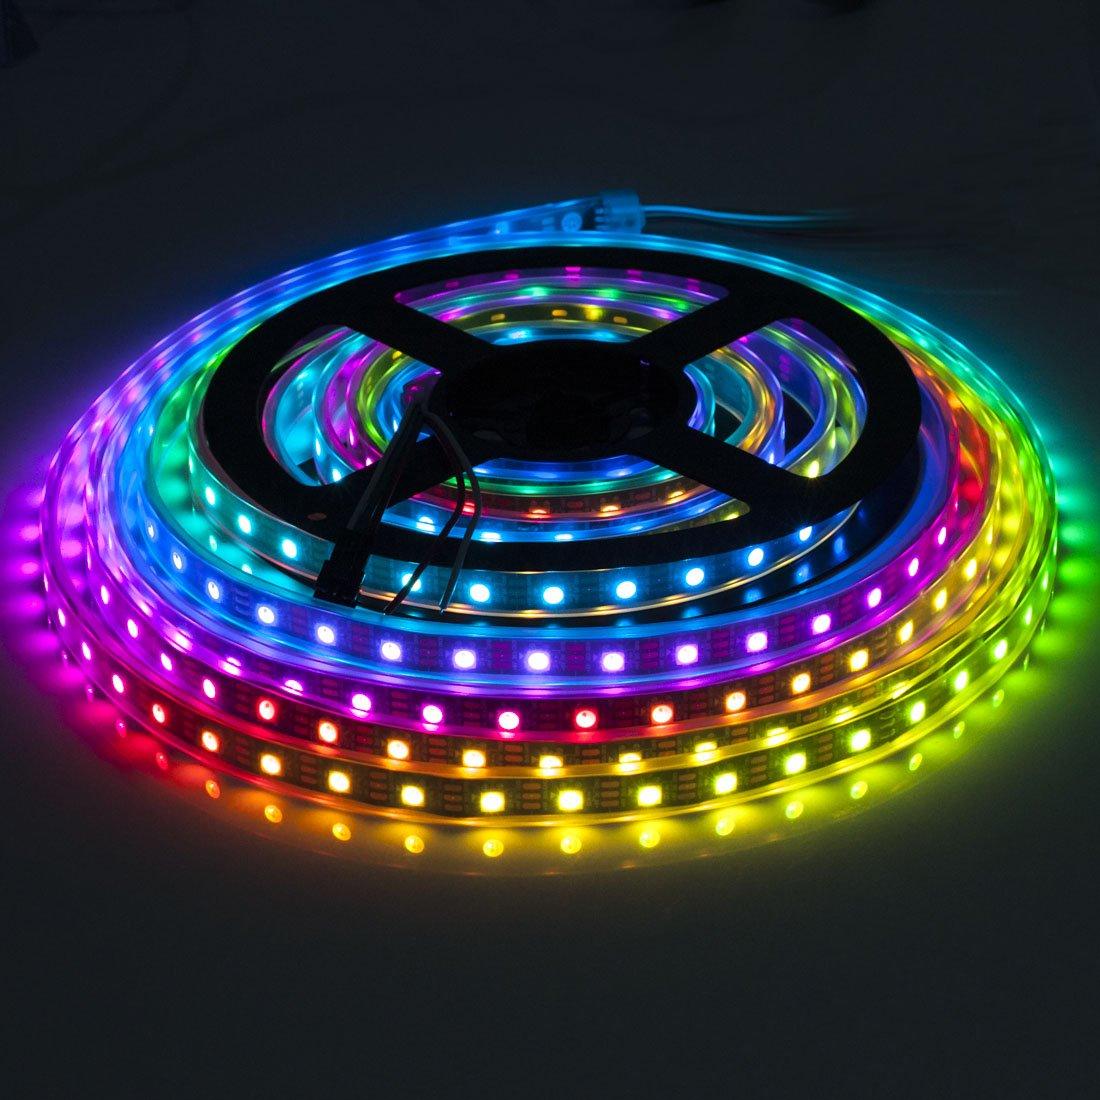 BTF-LIGHTING RGBW RGBWW Warmweiß SK6812 (ähnlich WS2812B) 5m 60leds pixels m Individuell adressierbar Flexibel 4 farbe in 1 LED Traumfarbe LED Streifen Wasserdicht IP67 DC5V Schwarz PCB